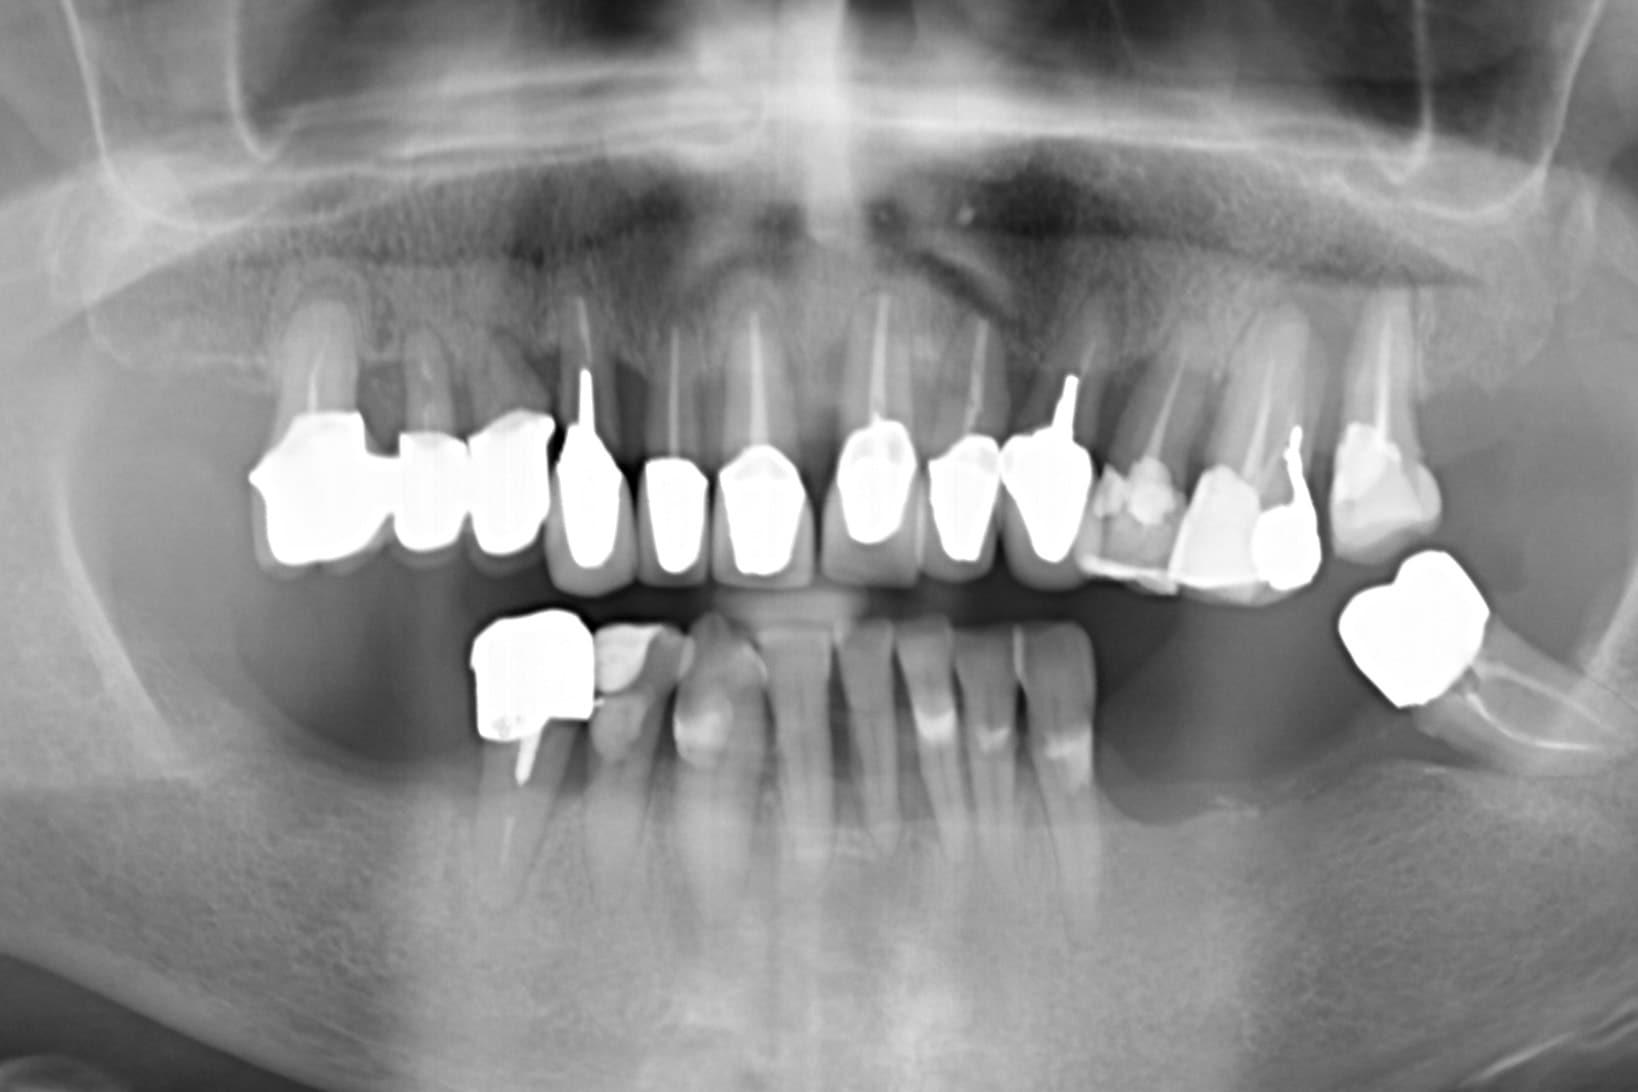 parodontite cura la panoramica iniziale